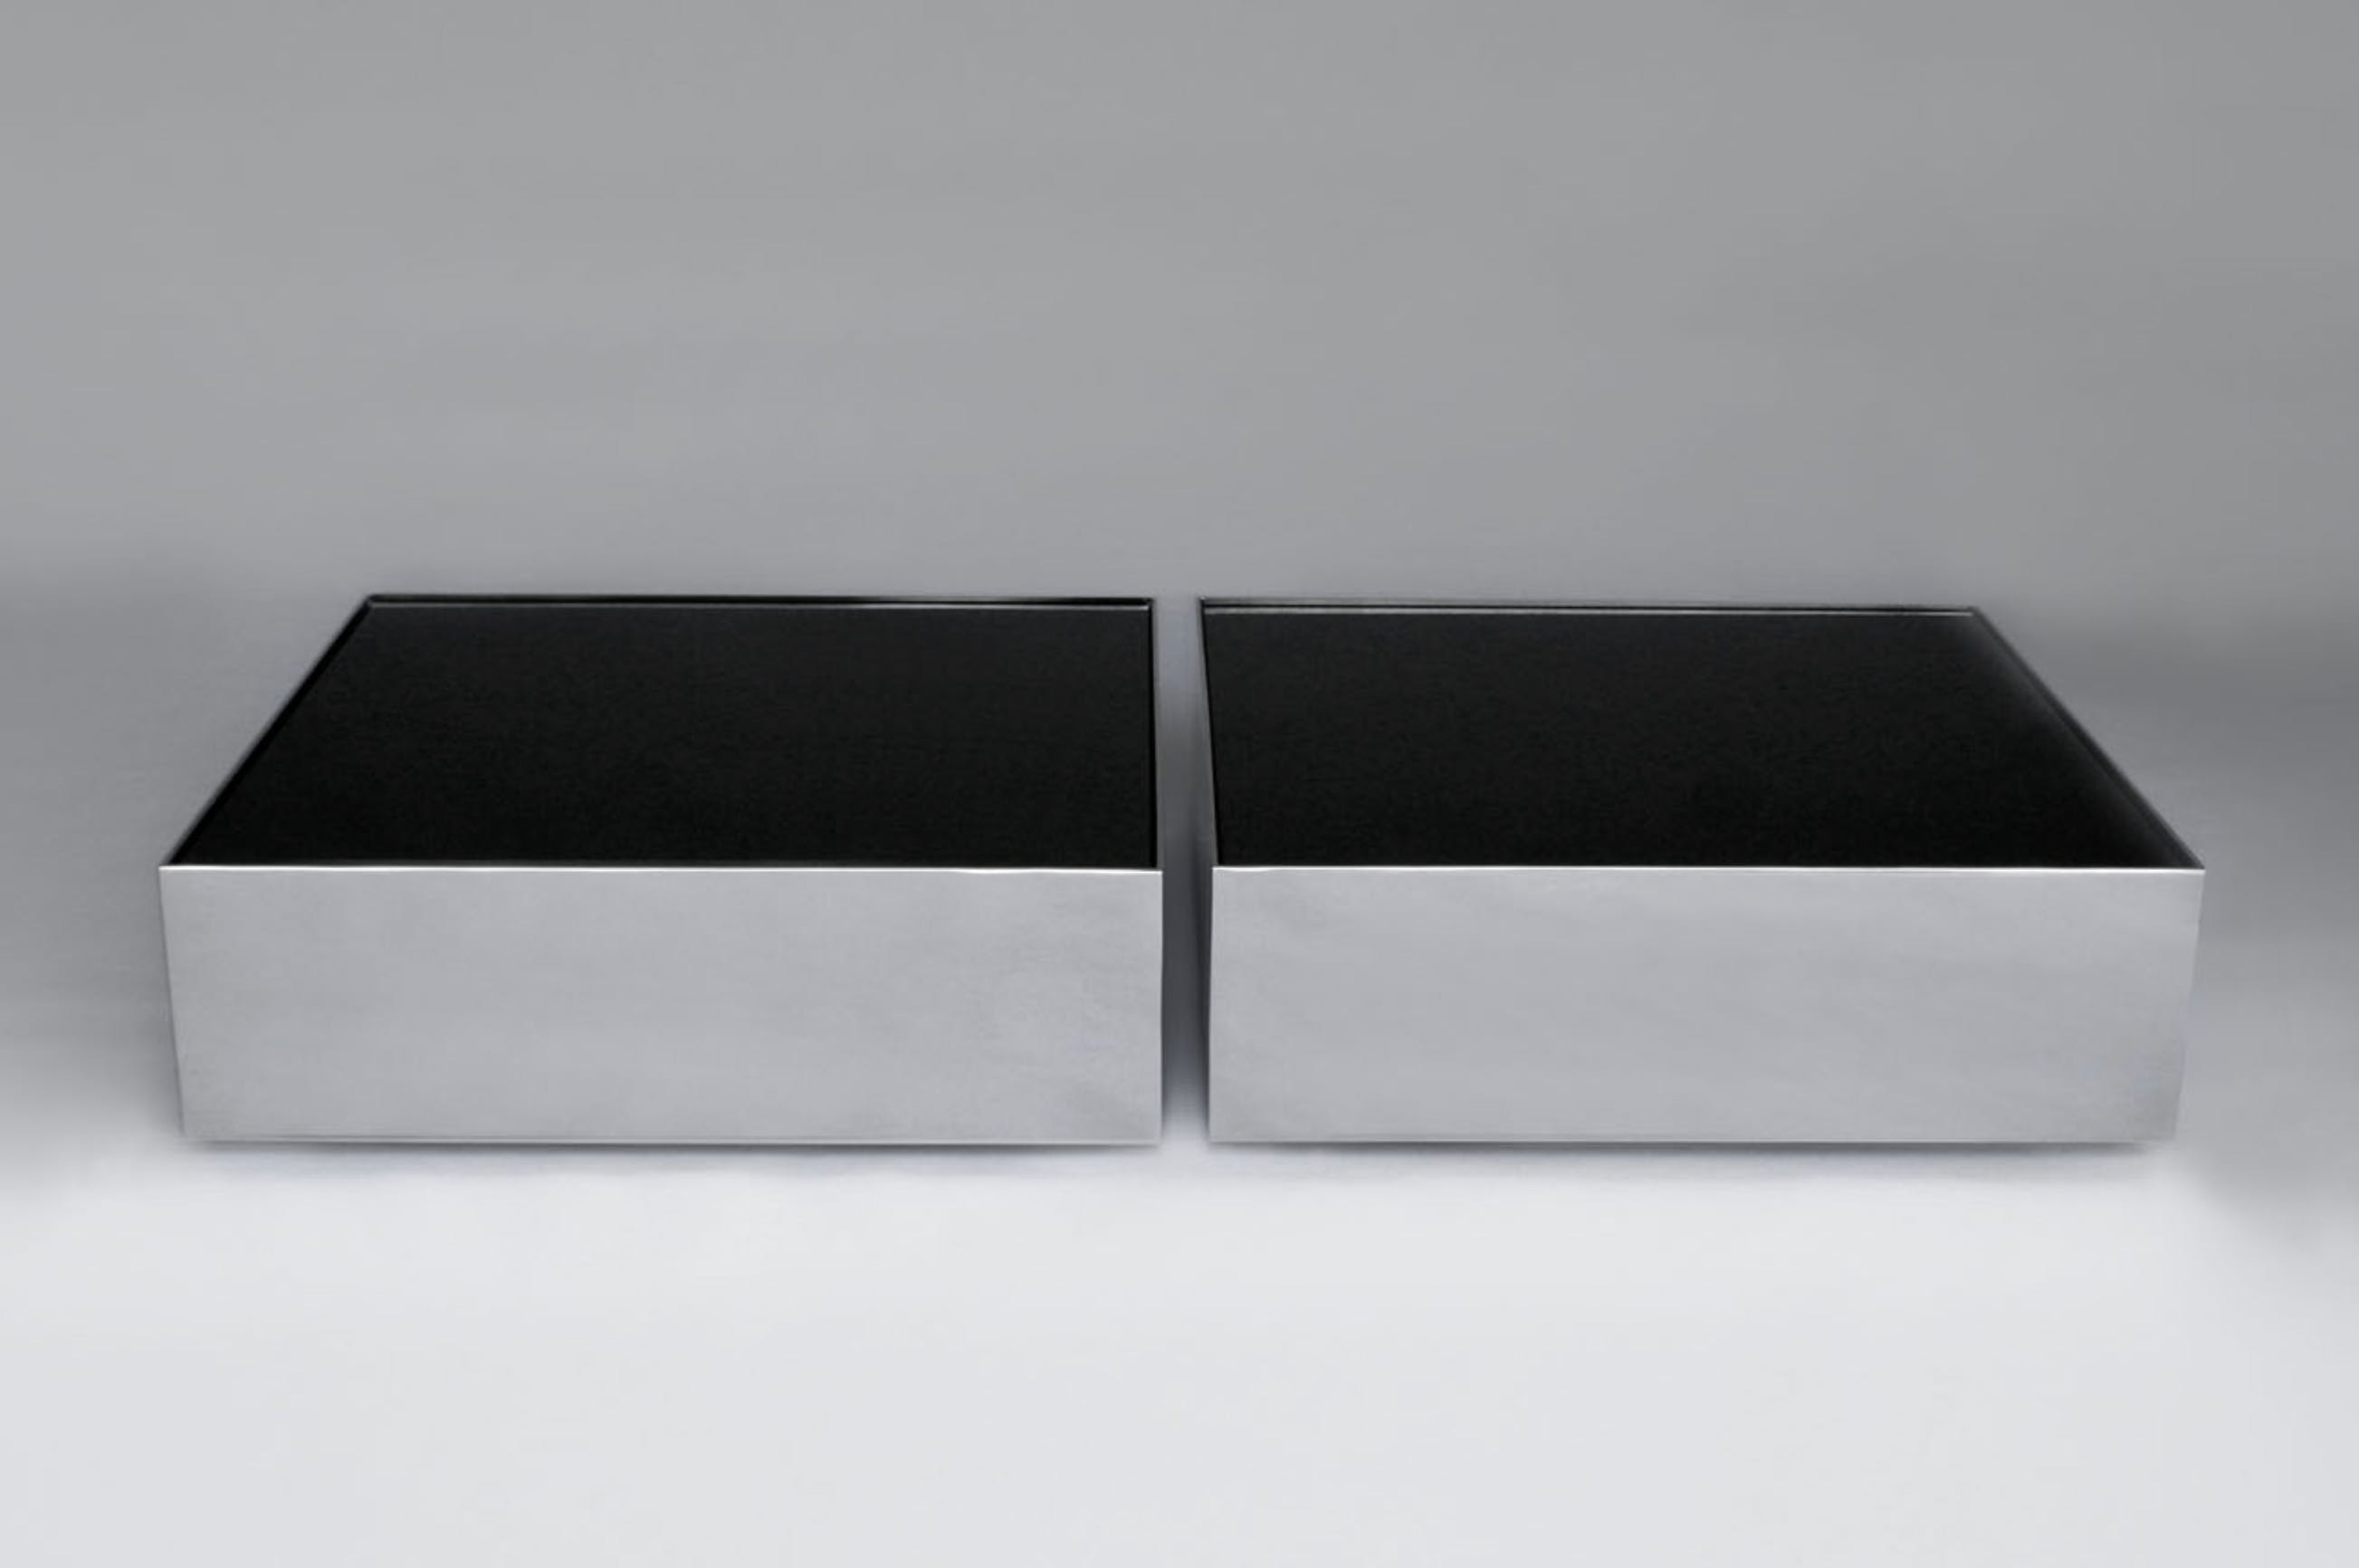 Phase Design Ballot Box Ice Double Haute Living